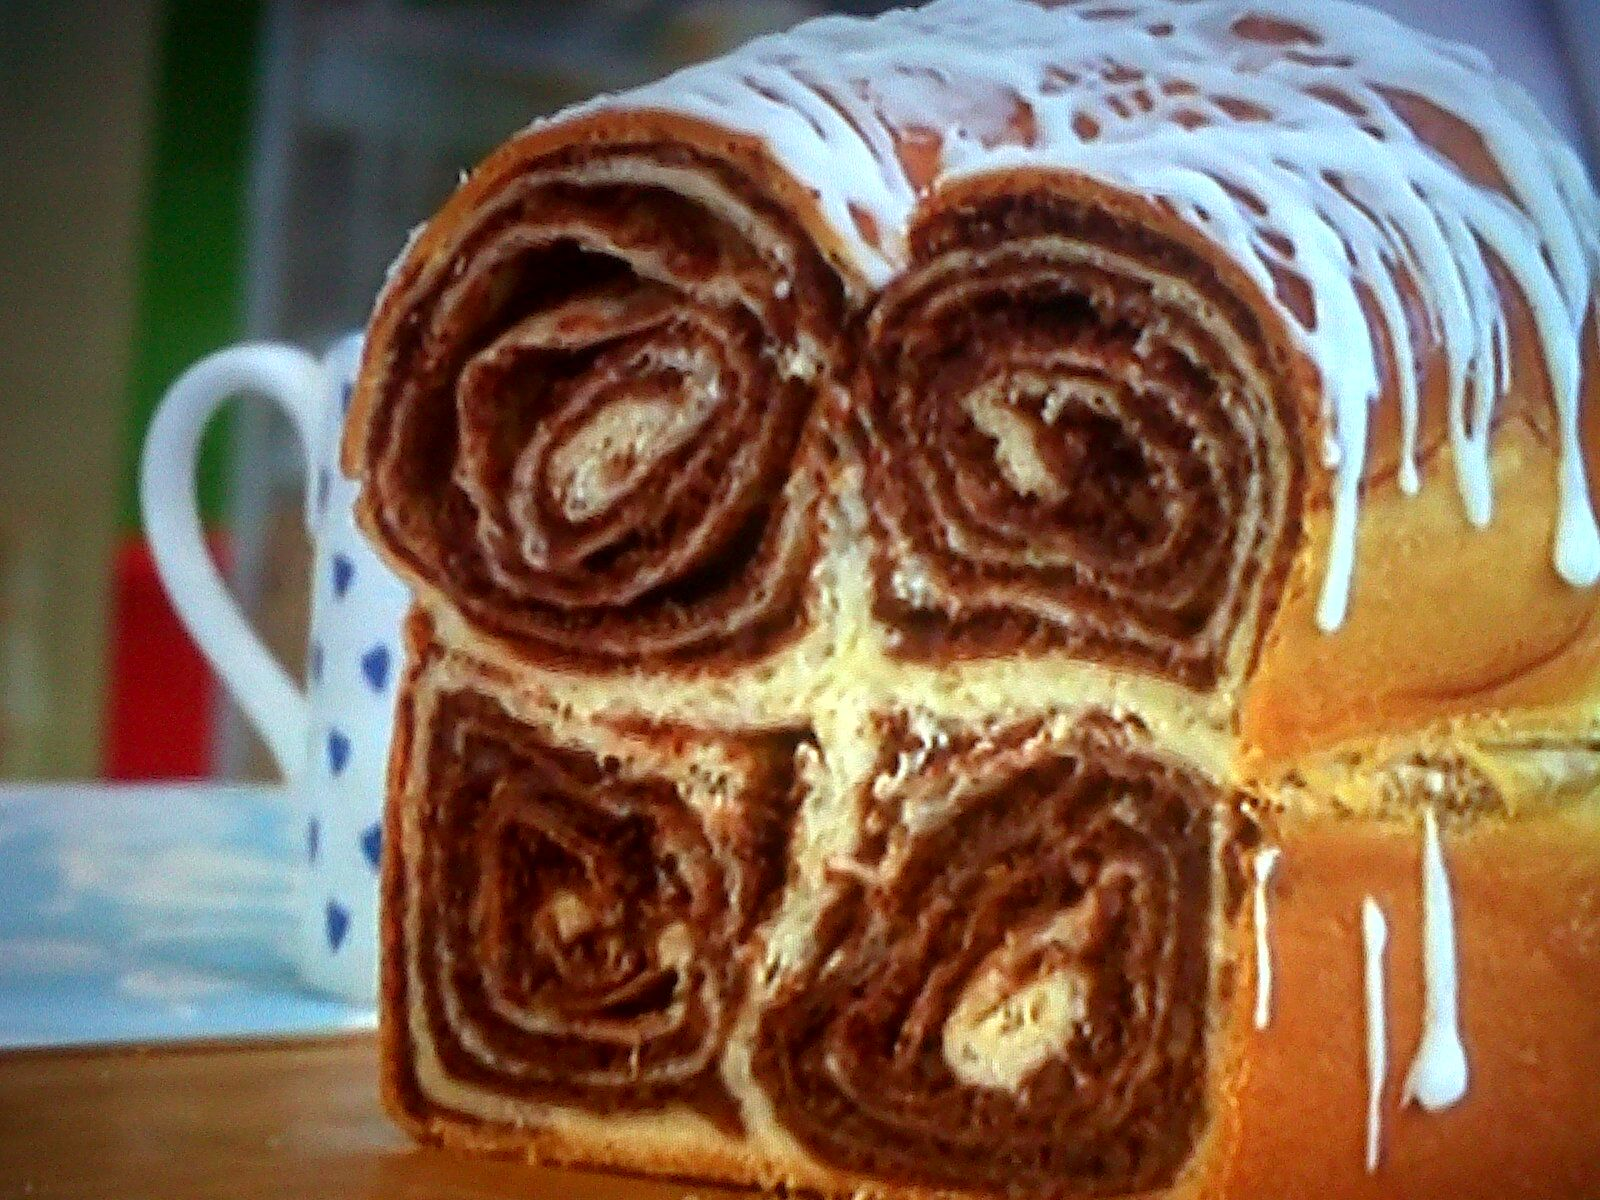 The Great British Bake Off  British bake off recipes, British